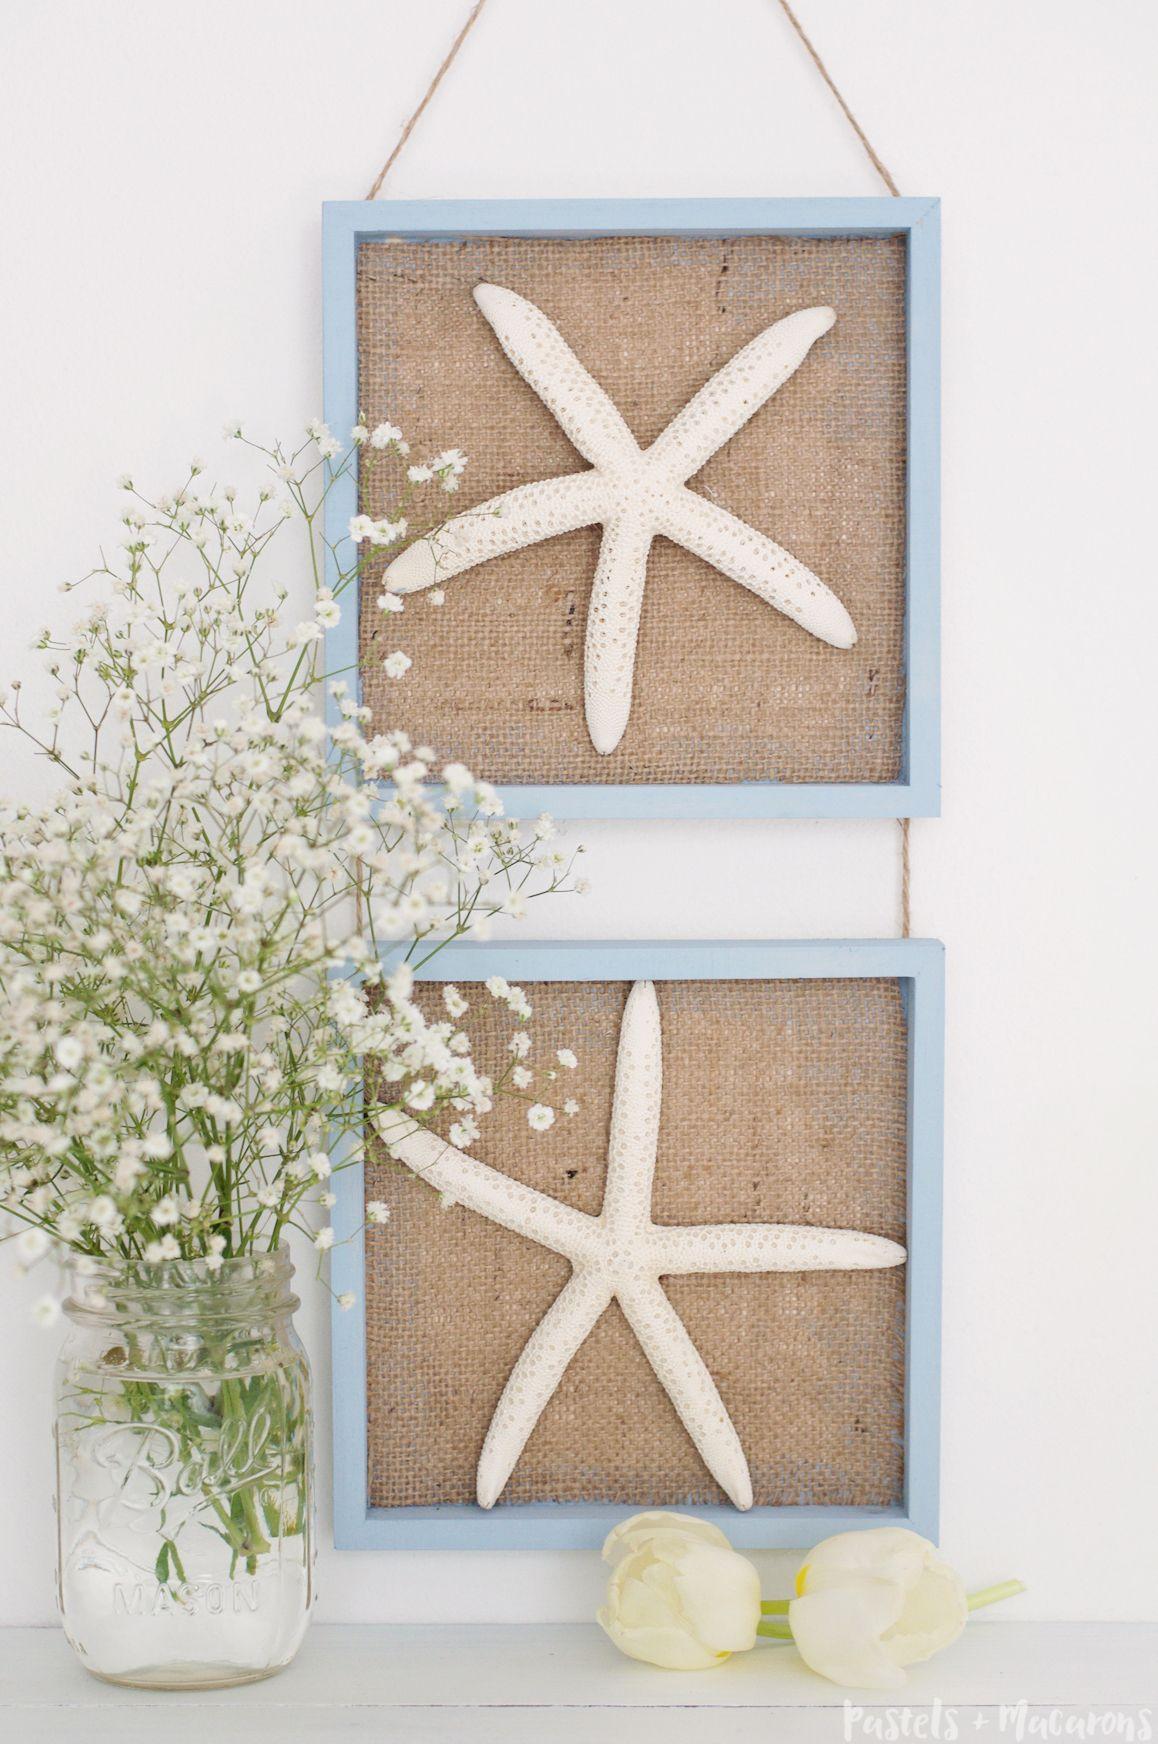 Gorgeous diy starfish wall art decor for the coastal inspired home gorgeous diy starfish wall art decor for the coastal inspired home amipublicfo Choice Image